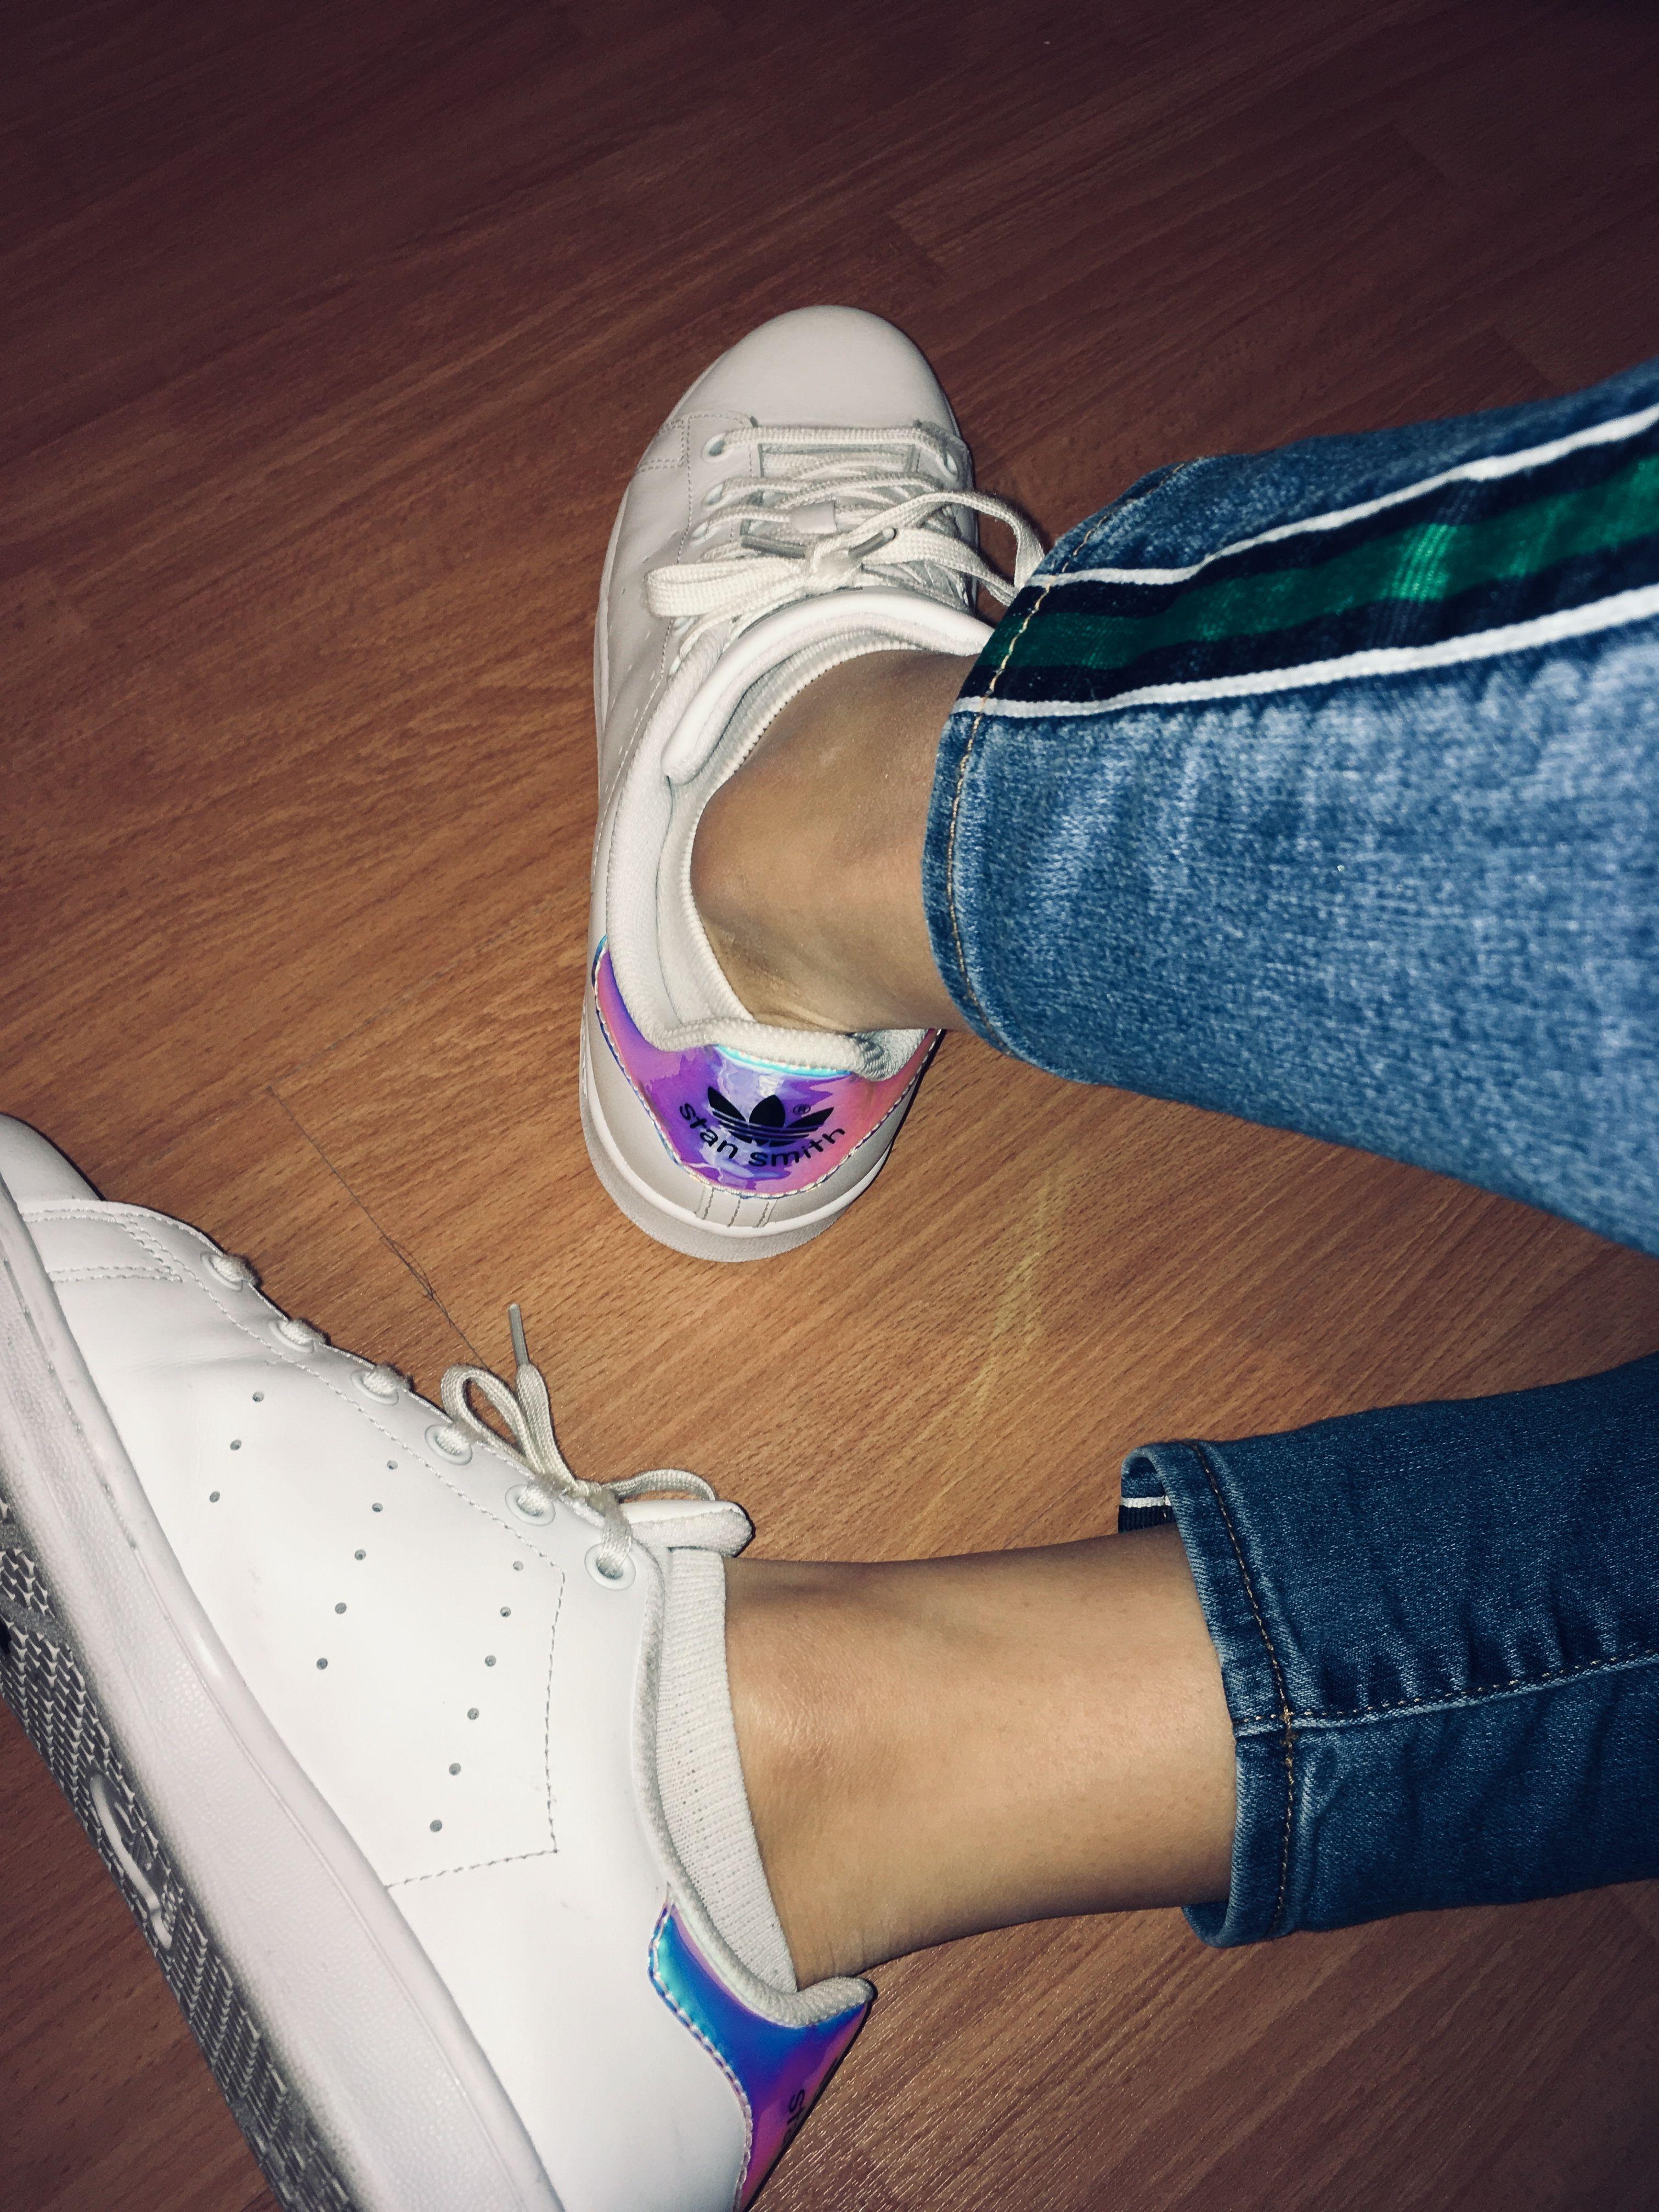 Pin by Gai on Shoes   Adidas stan smith, Fashion, Stan smith